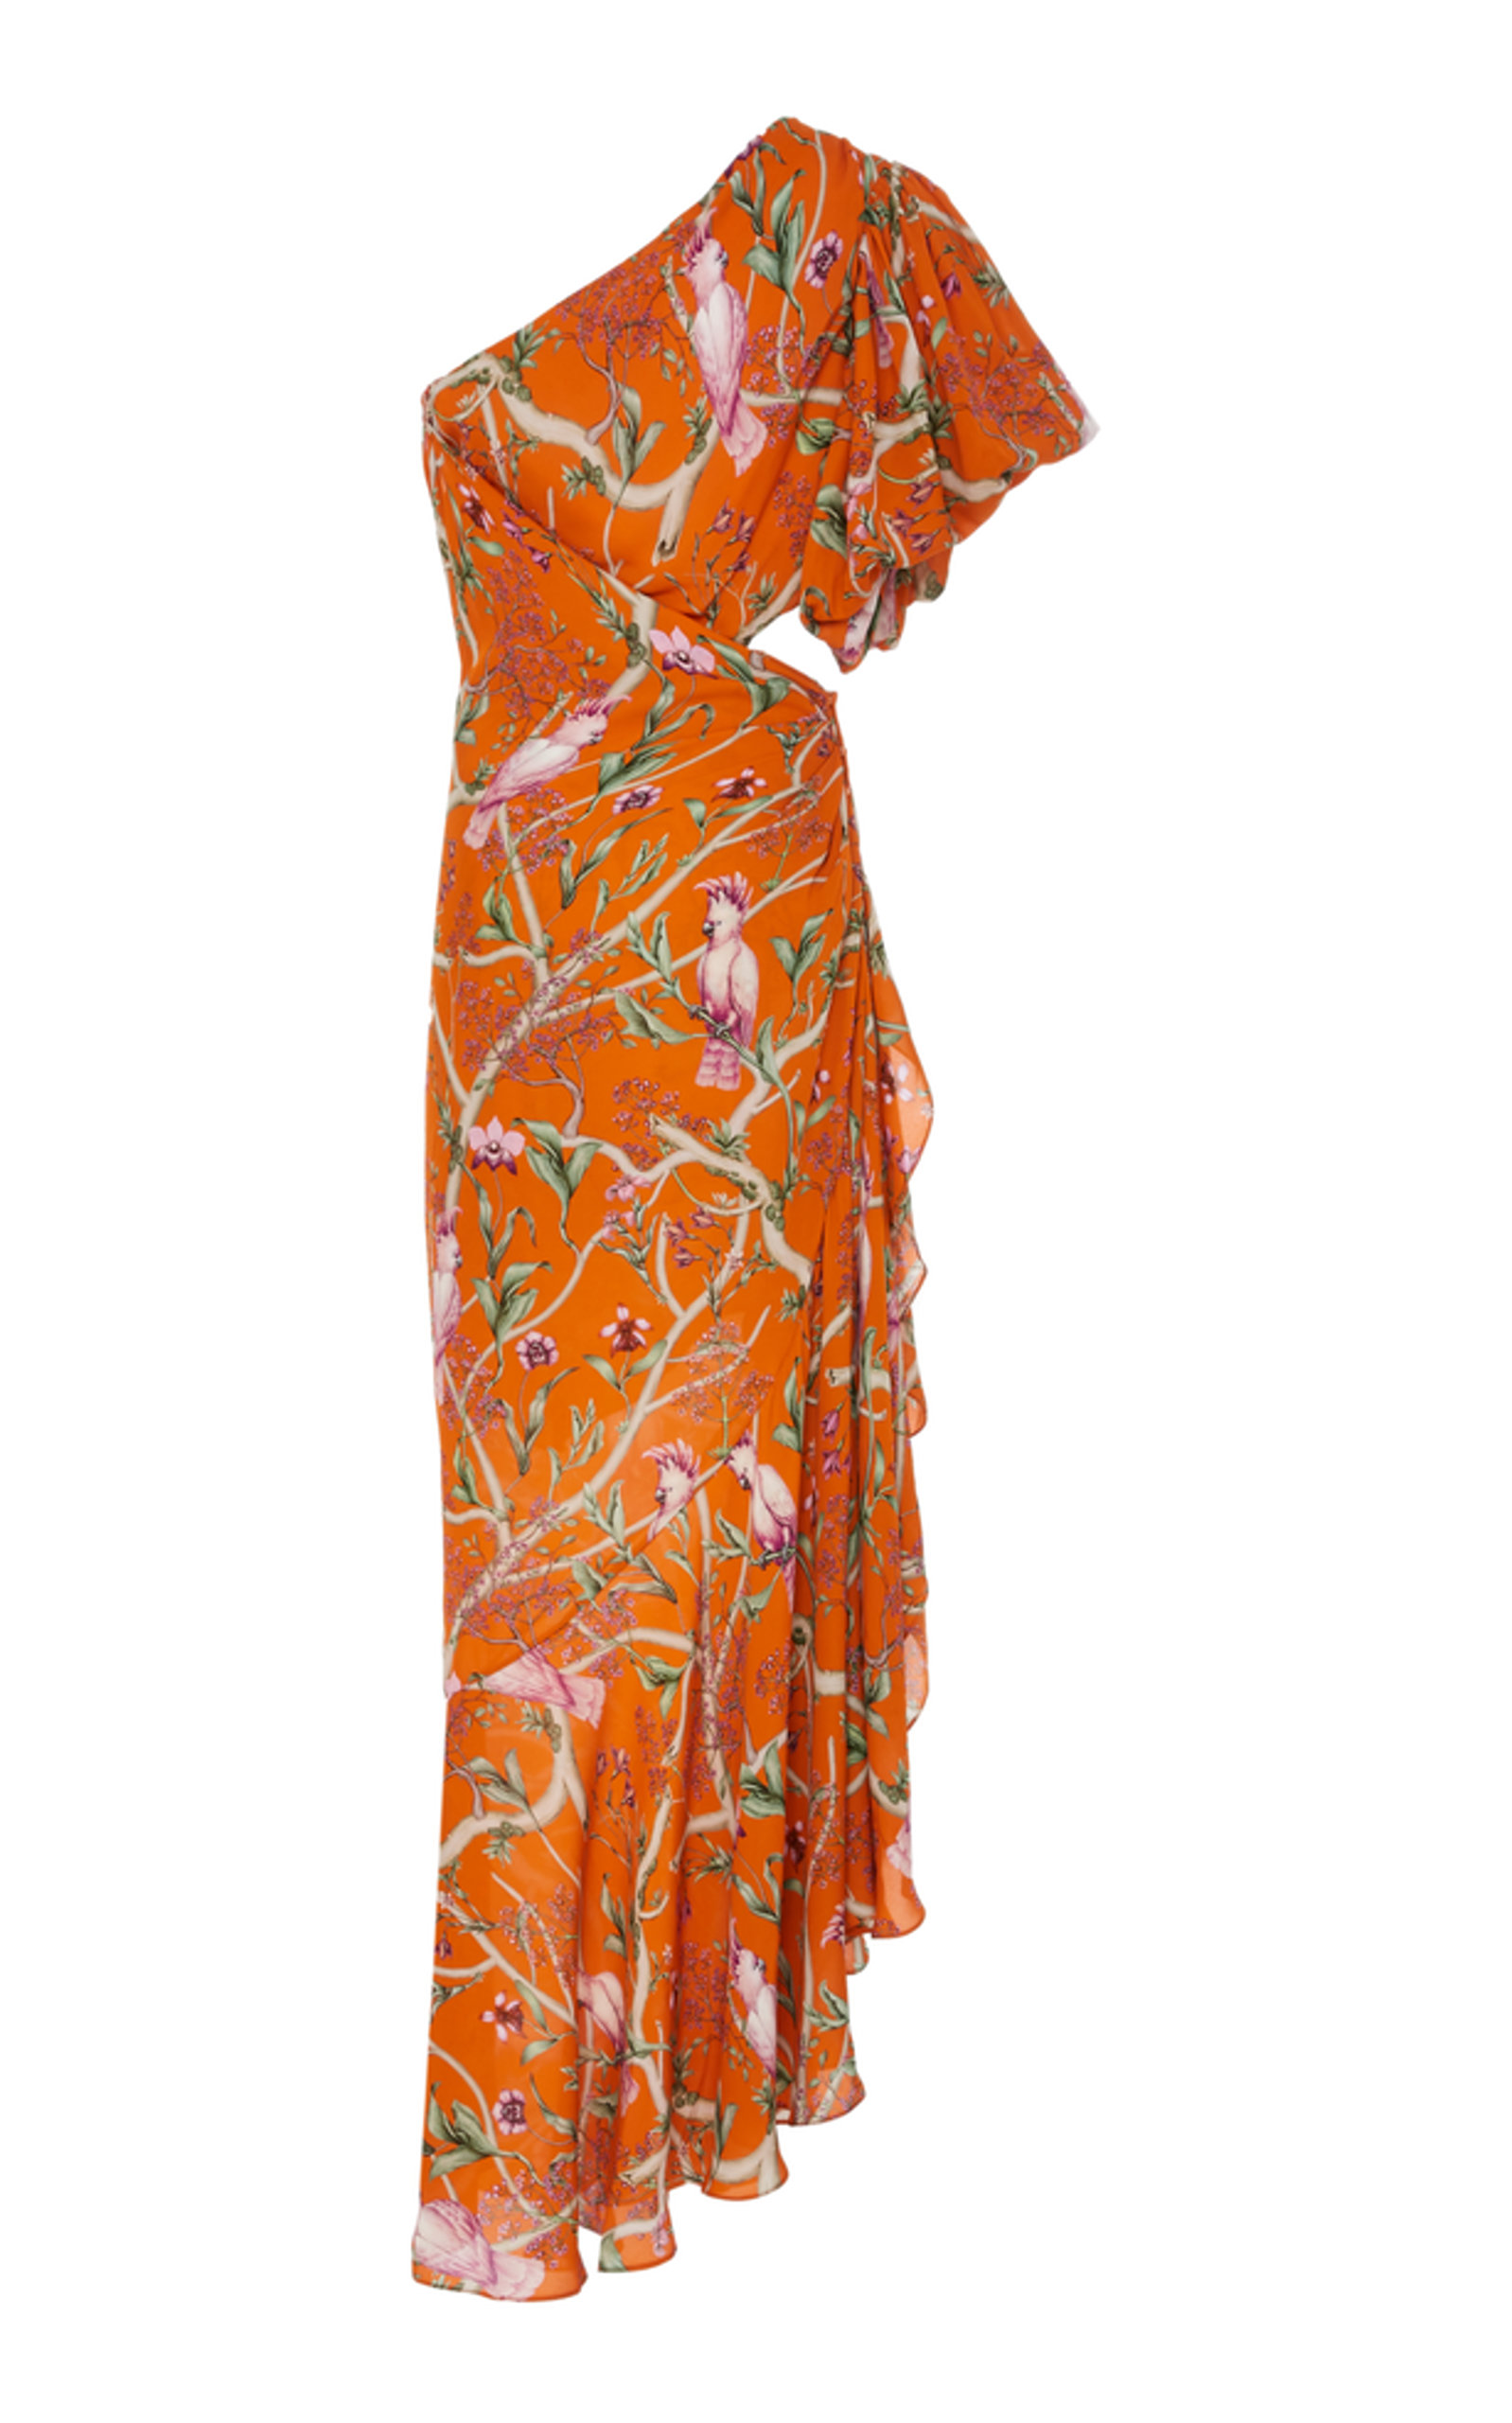 50363d4cff3 Johanna OrtizFirefly Silk Georgette Dress. CLOSE. Loading. Loading